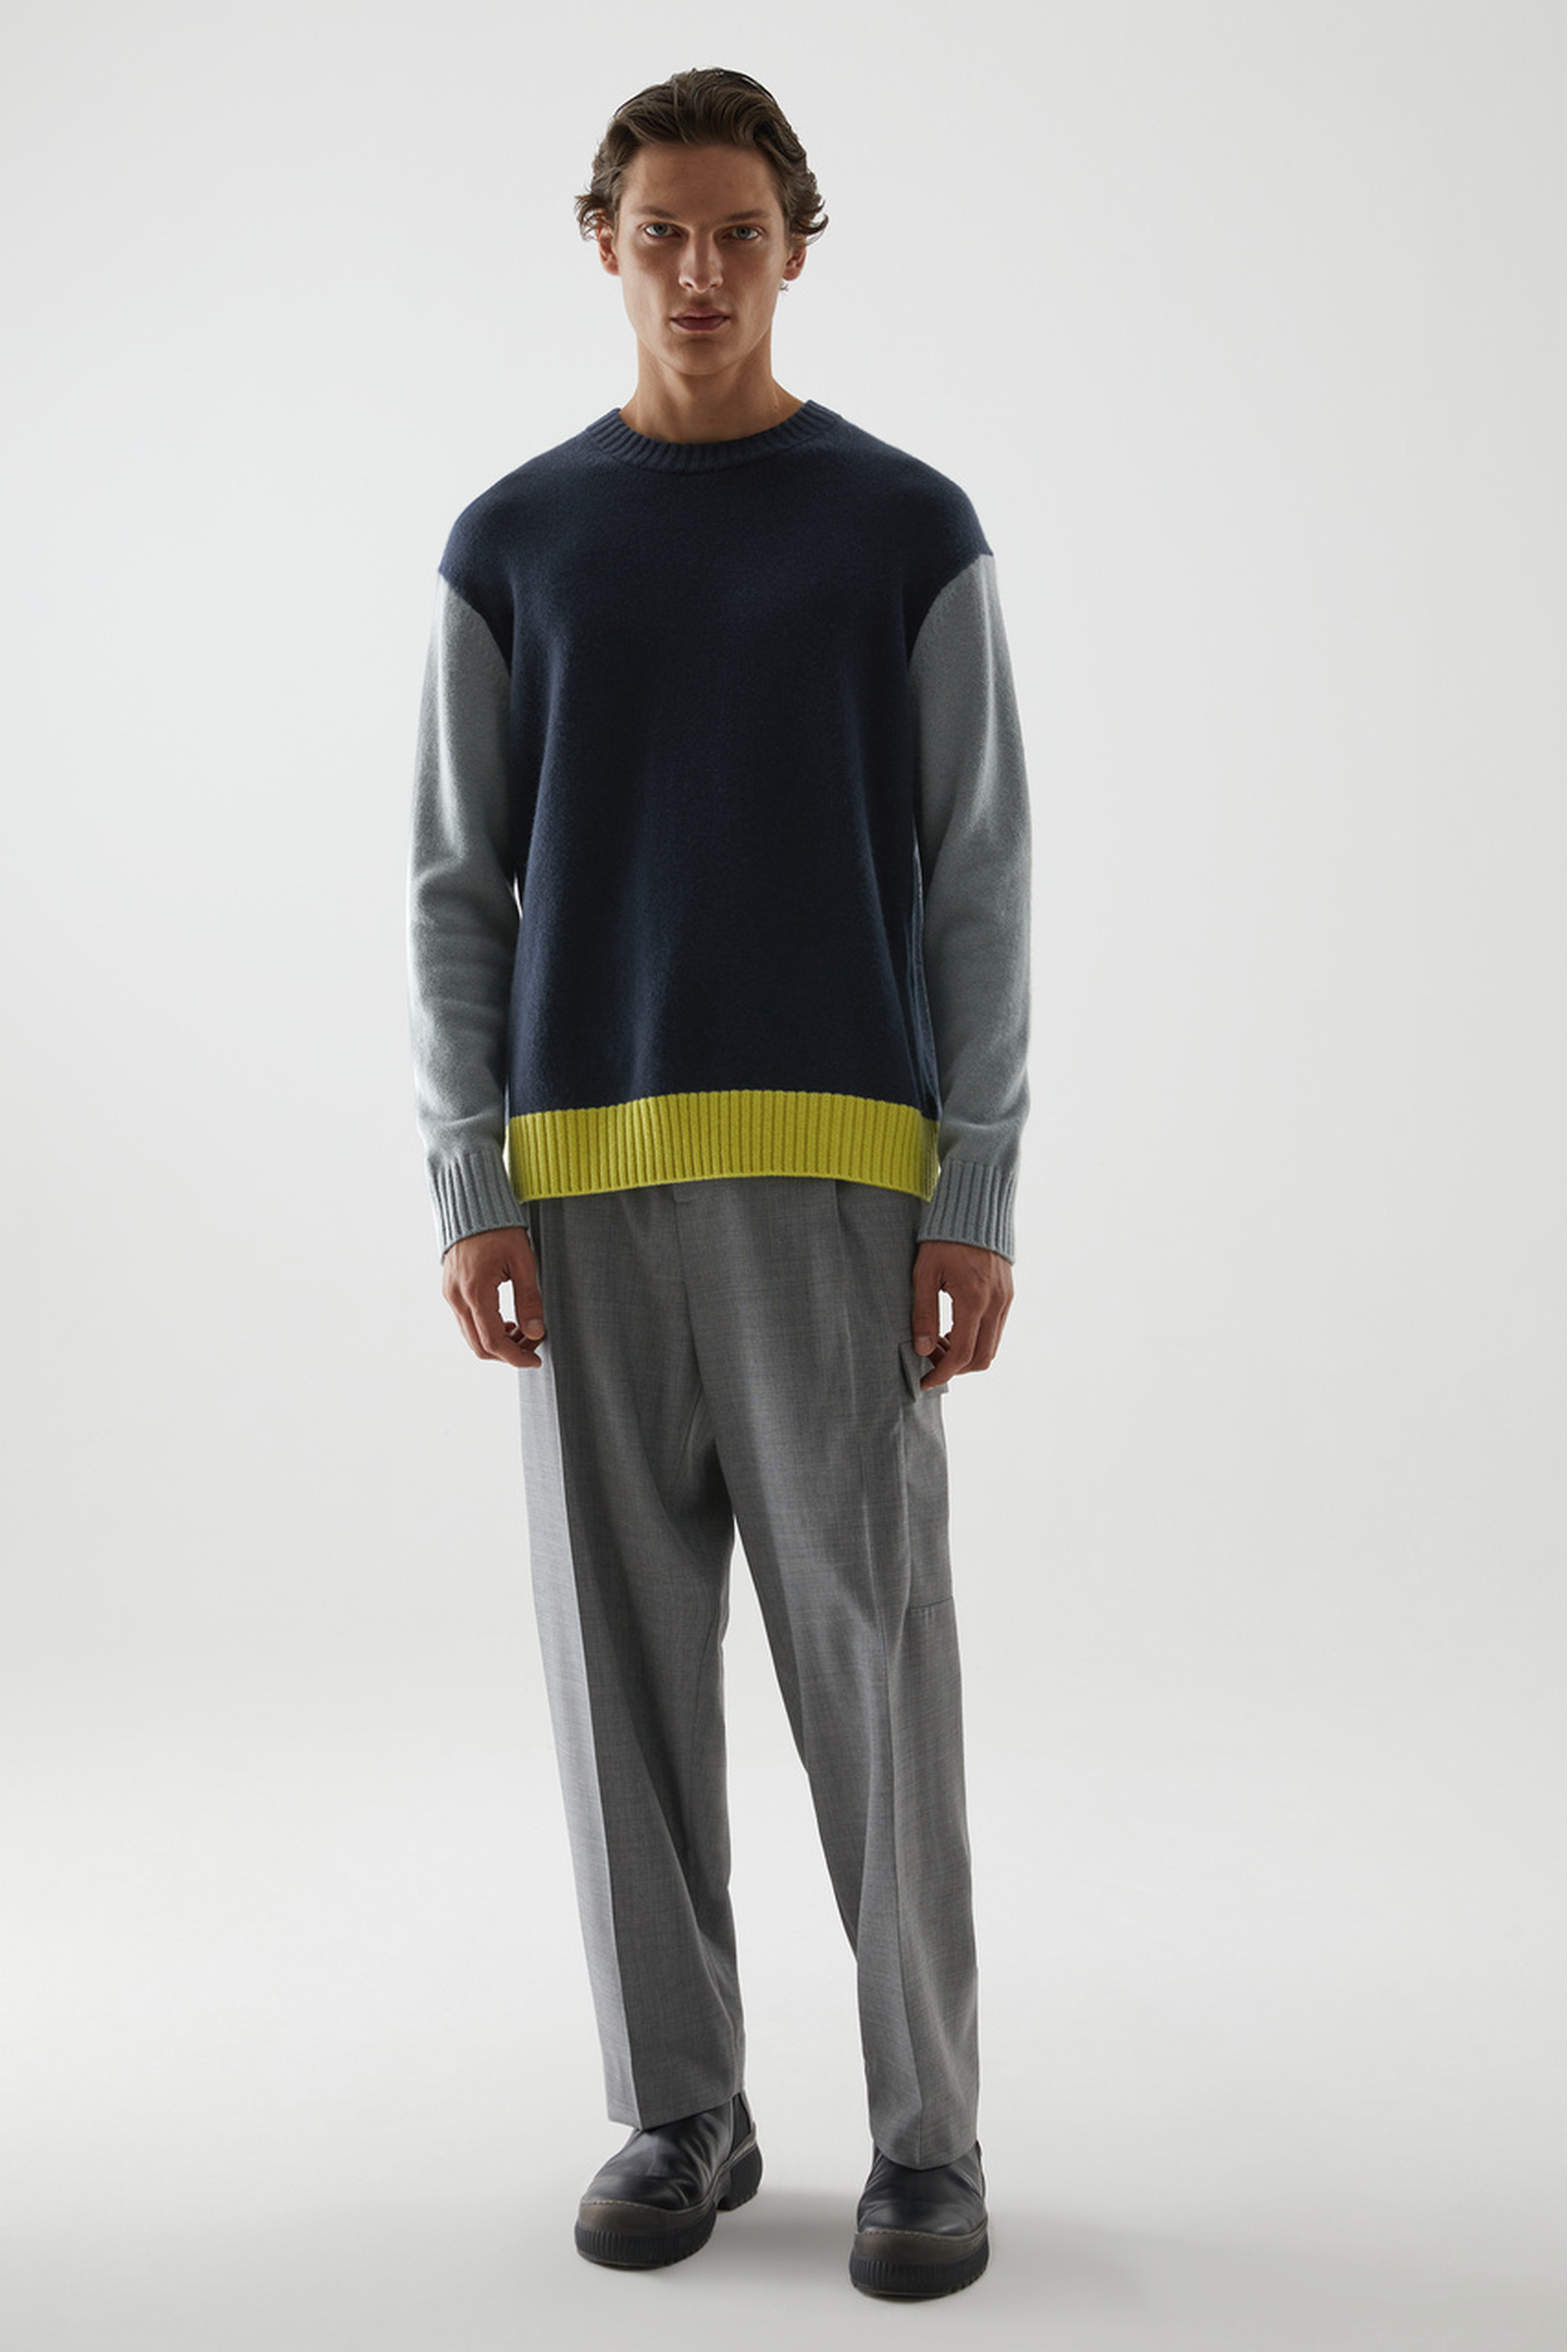 COS 캐시미어 컨트래스트 패널 스웨터의 네이비 / 그레이 / 옐로우컬러 ECOMLook입니다.